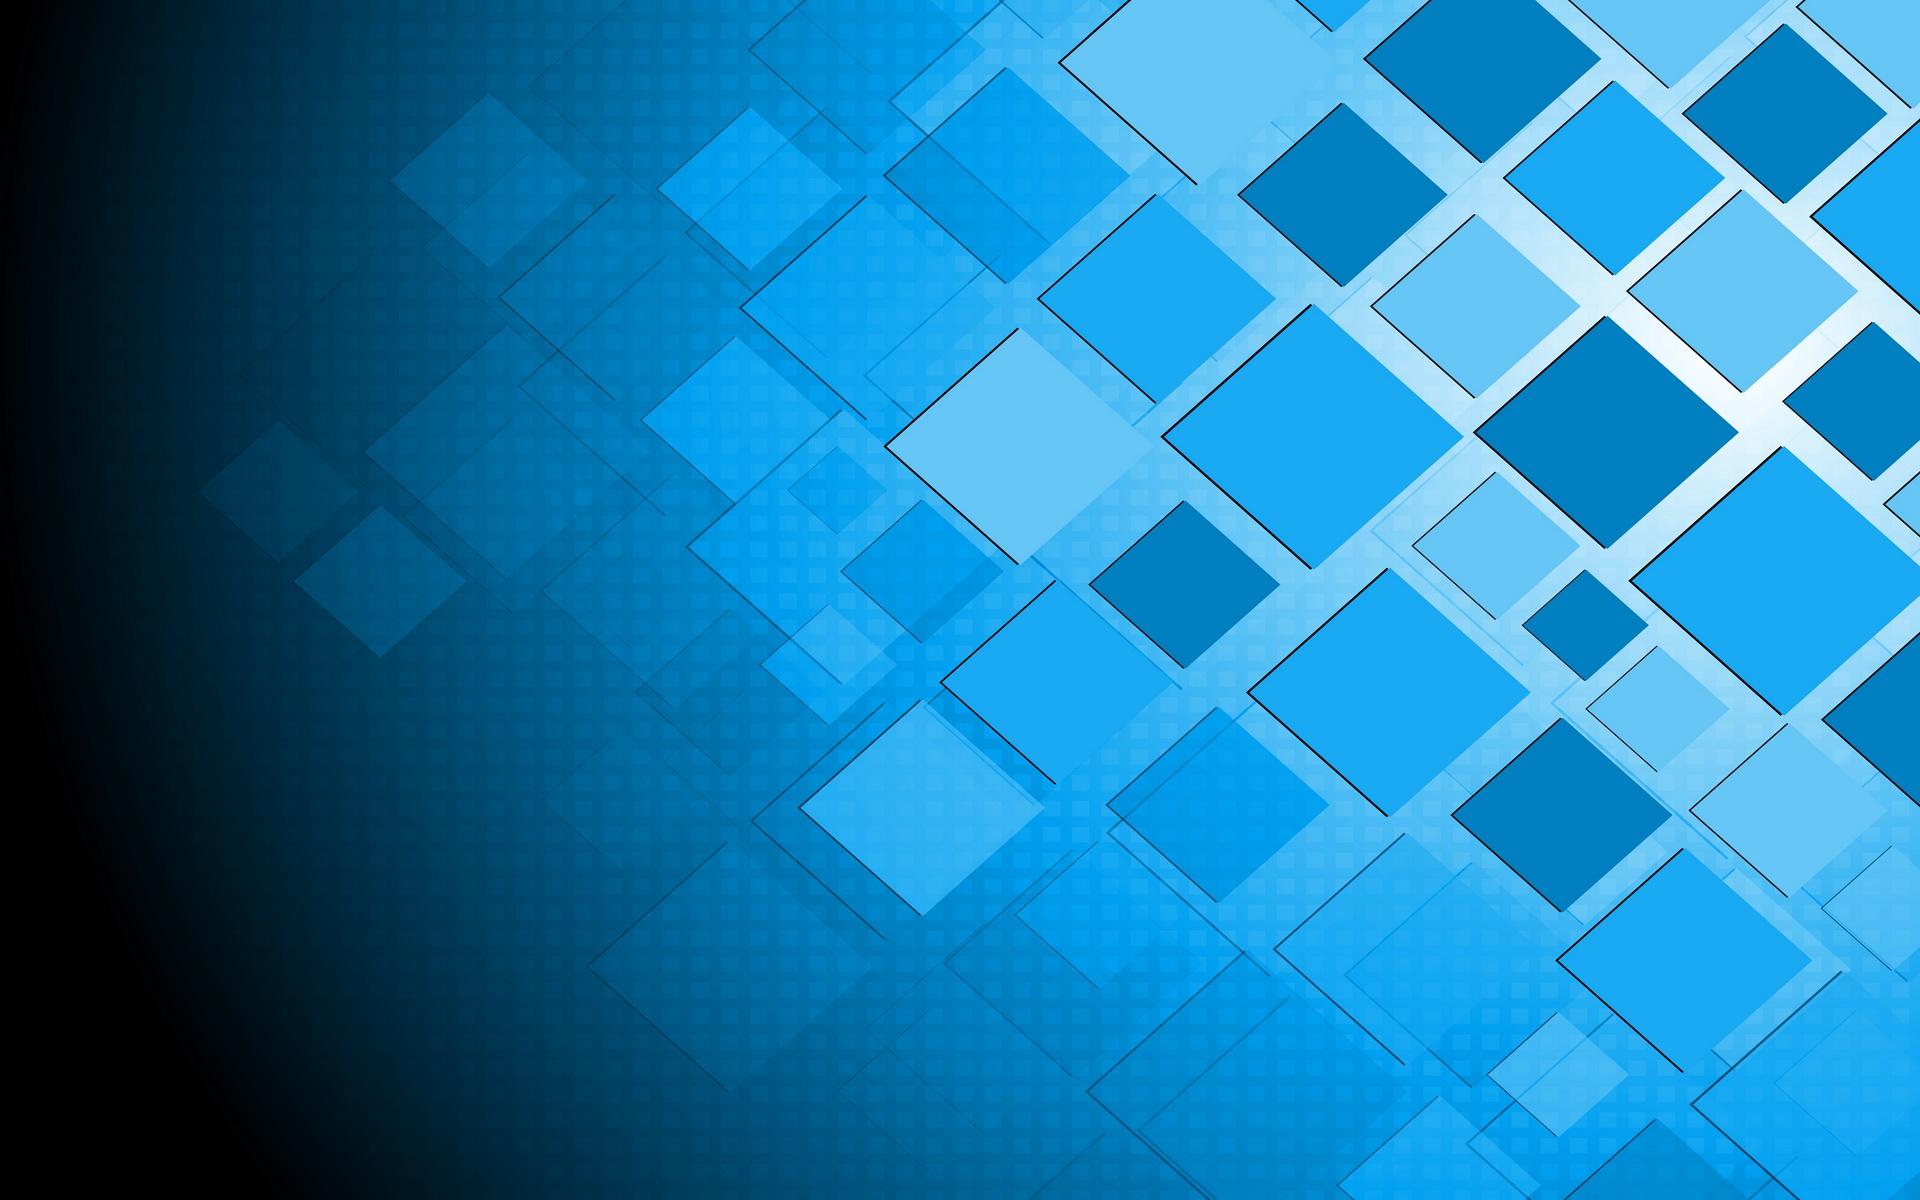 Cubes 3d Wallpaper Cube Hd Wallpaper Background Image 1920x1200 Id